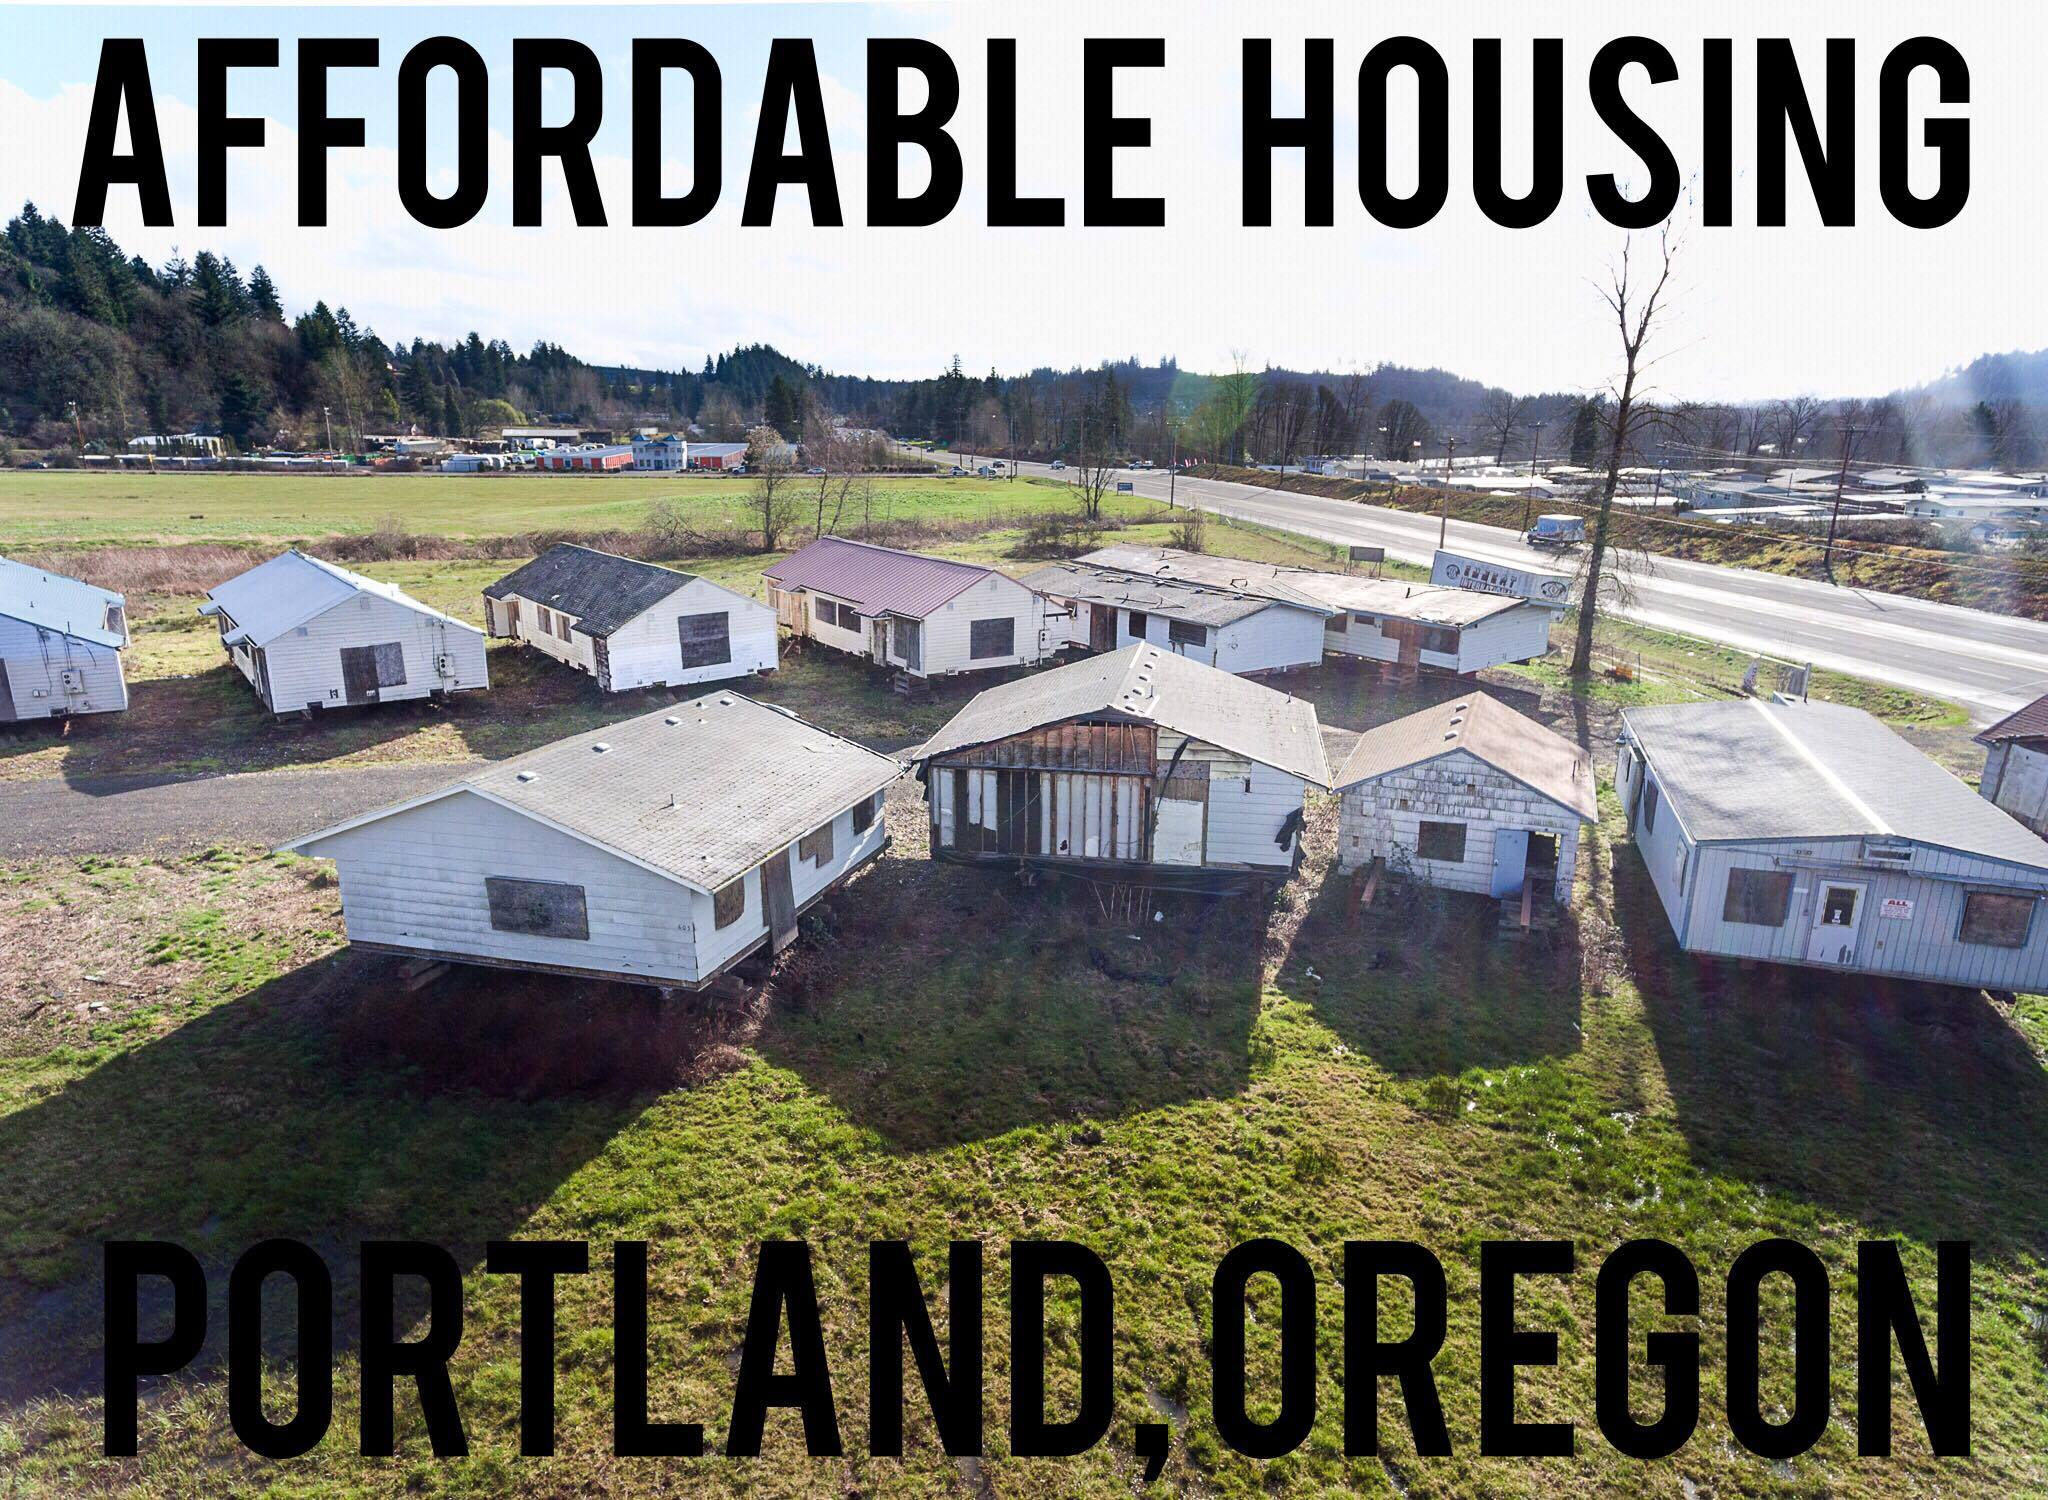 Affordable Housing in Portland - Landlord vs Tenant Battle ...